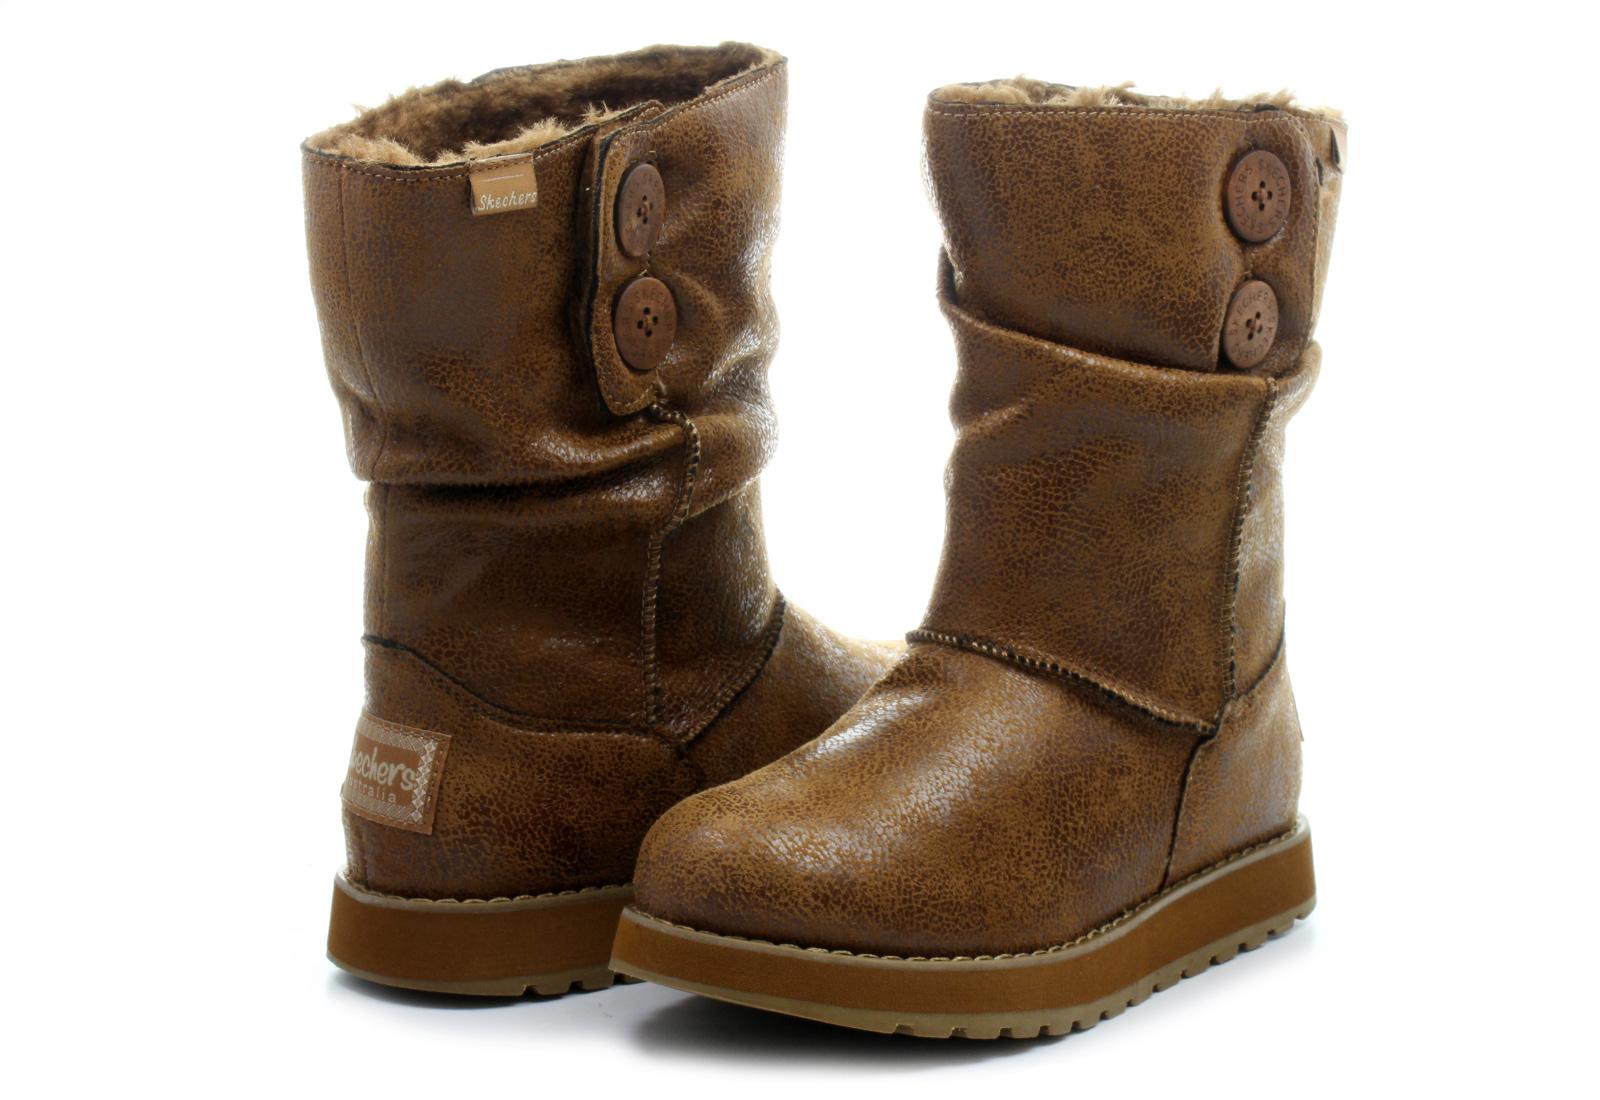 Skechers Vysoké boty - Keepsakes - Leather-esque - 48367 ... 4a1bba9a26